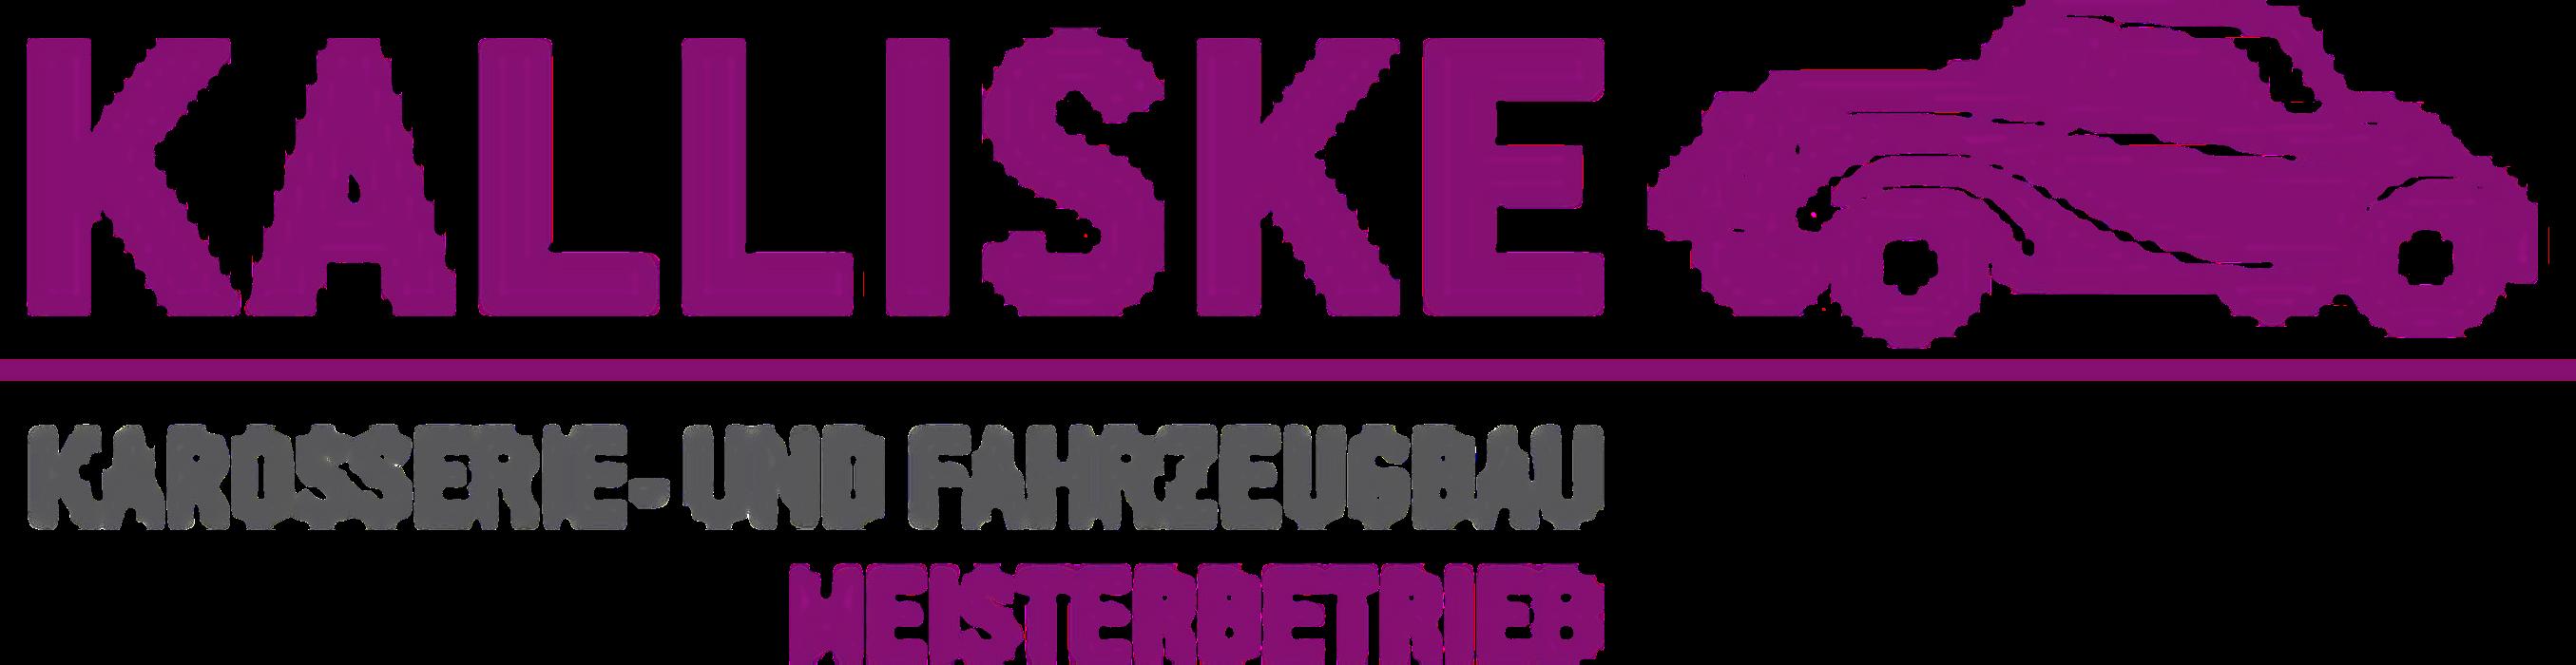 Bild zu Kalliske GbR - Karosserie & Fahrzeugbau Meisterbetrieb in Trebbin